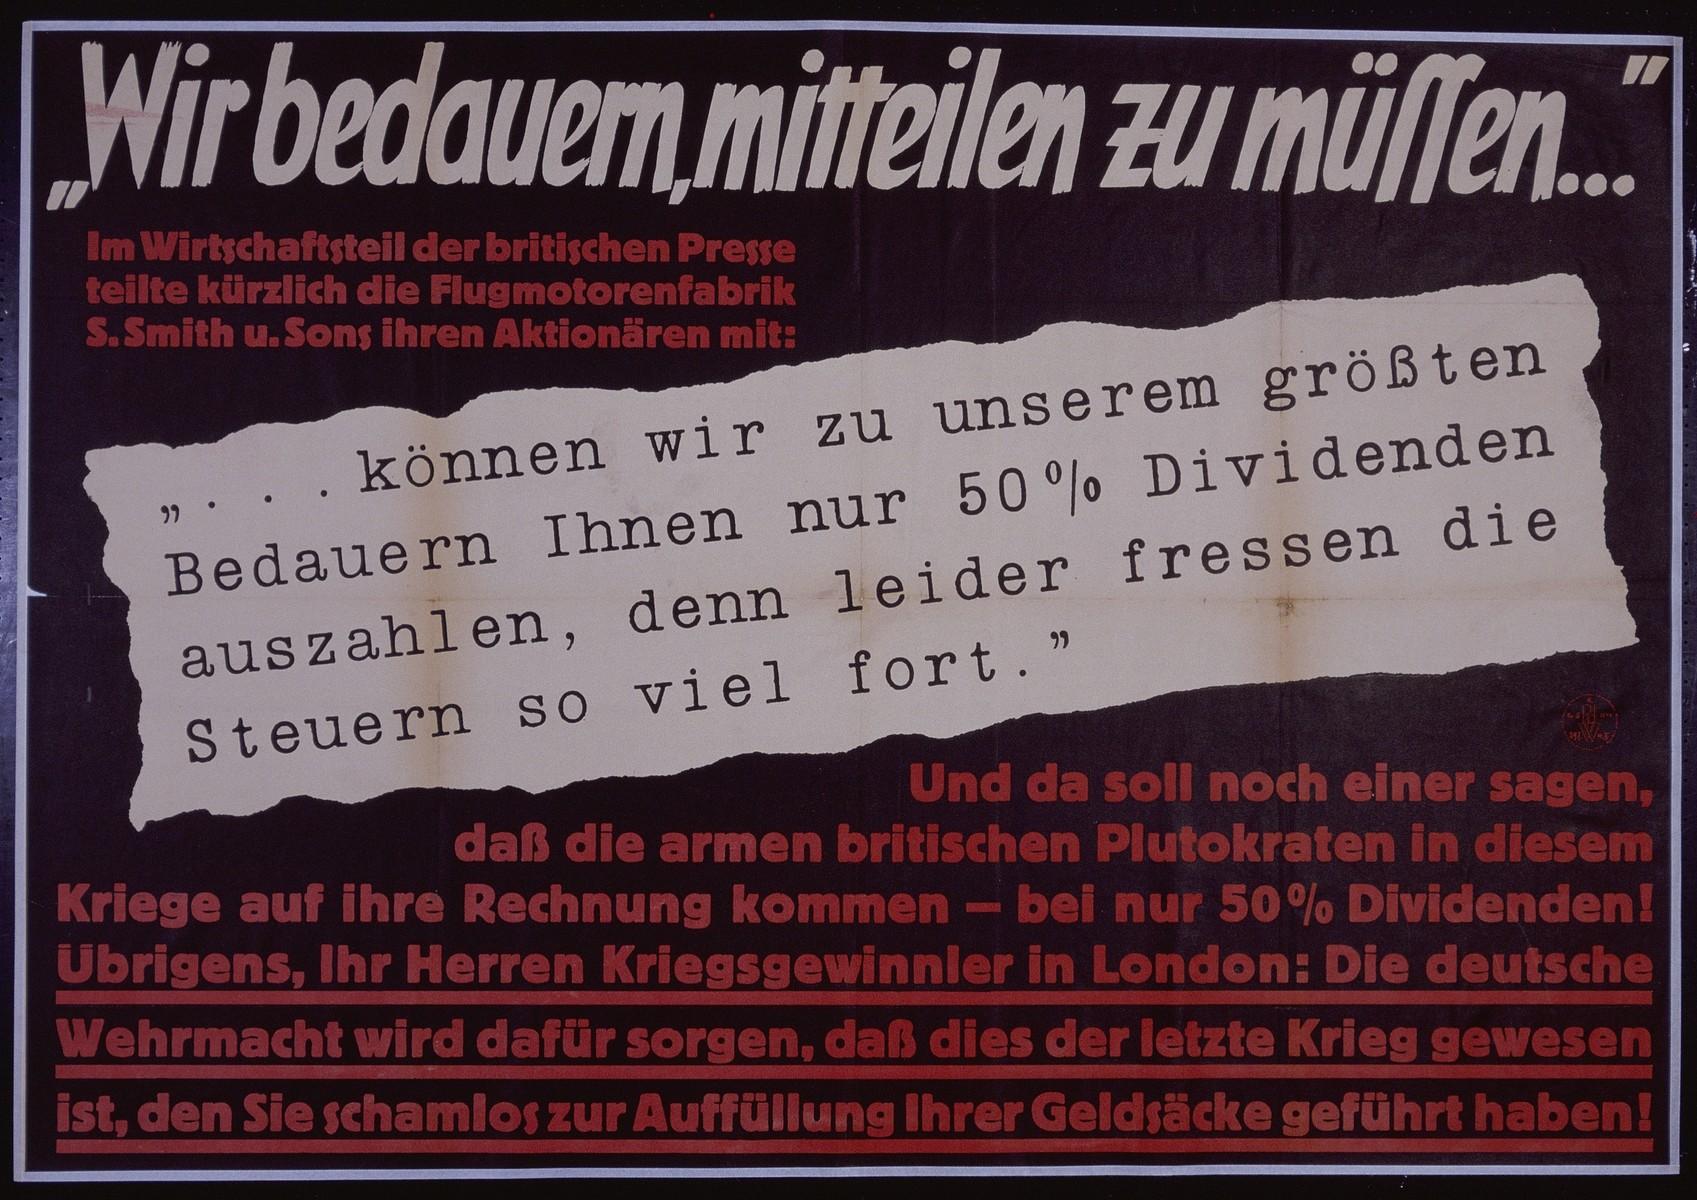 "Nazi propaganda poster entitled, ""Wir bedauern, mitteilen zu mussen,"" issued by the ""Parole der Woche,"" a wall newspaper (Wandzeitung) published by the National Socialist Party propaganda office in Munich."